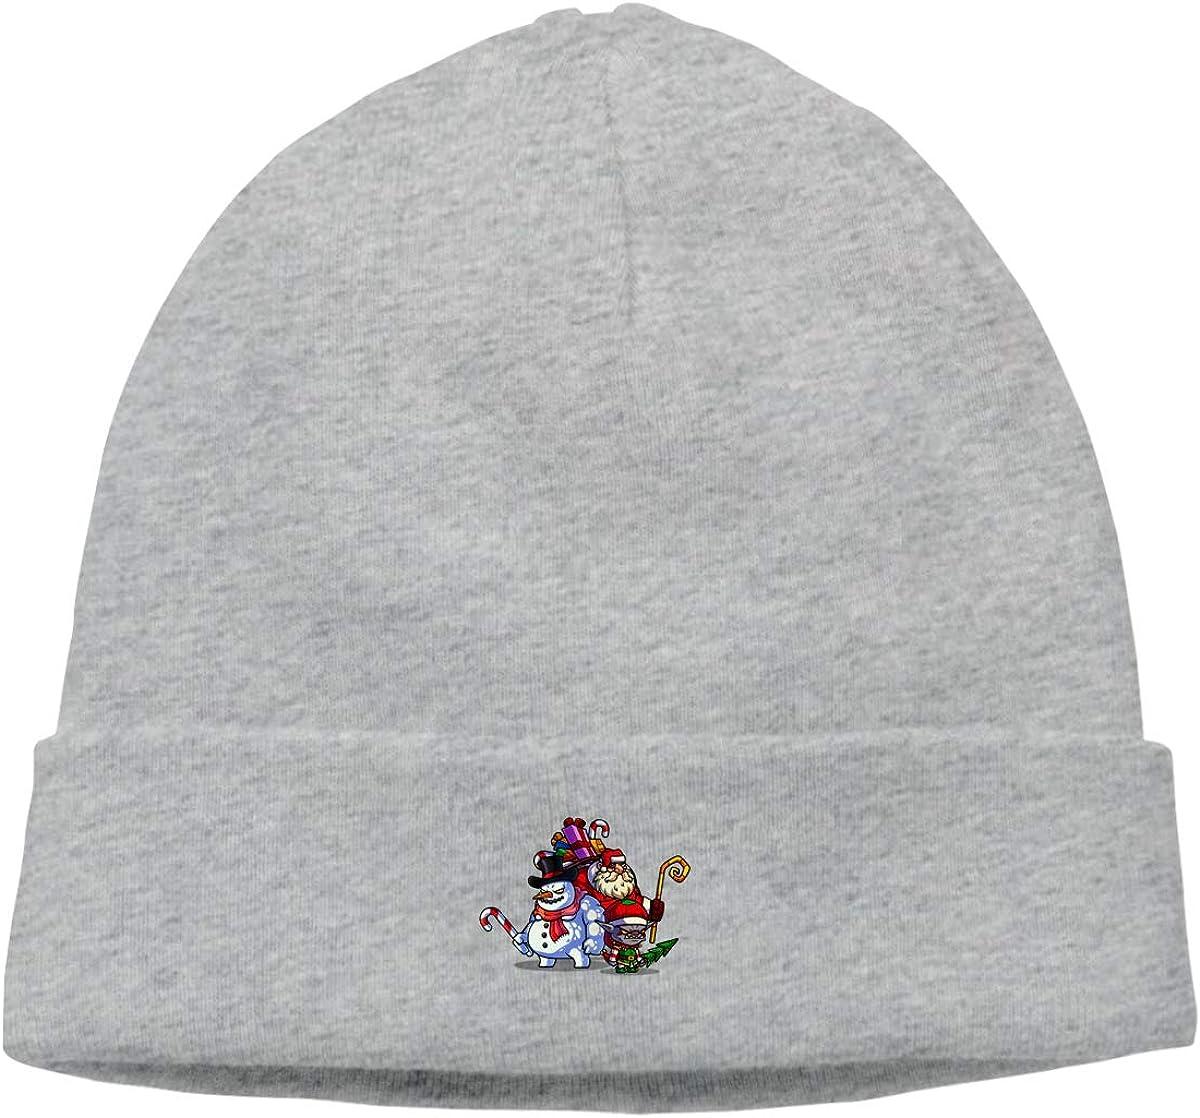 Snowman Santa Claus Knit Caps Knit Hat Skull for Men Gray